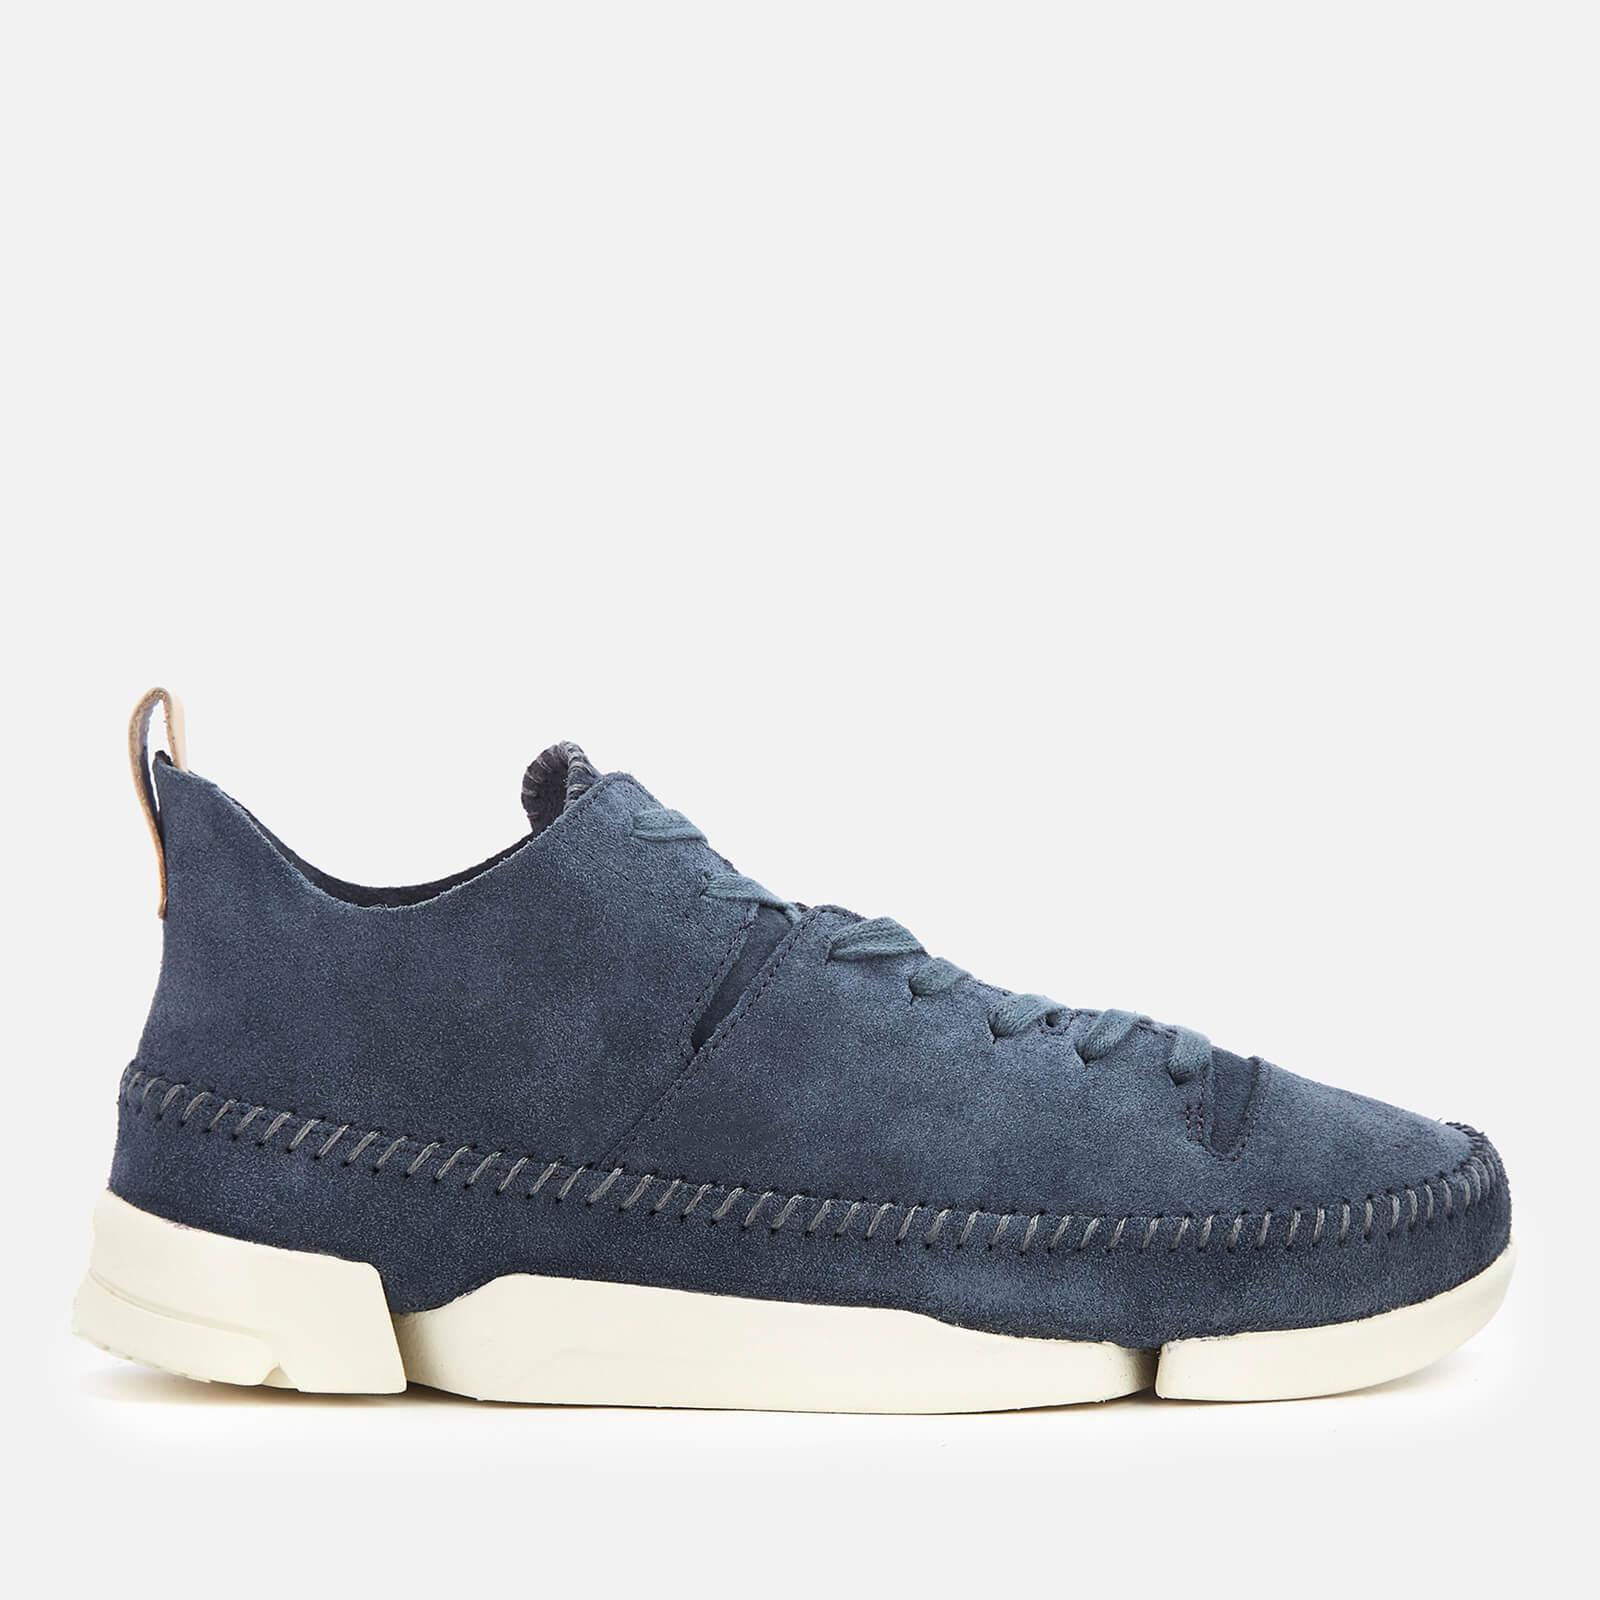 65b6c3d72 Clarks Originals Men s Trigenic Flex Suede Trainers - Deep Blue Mens  Footwear